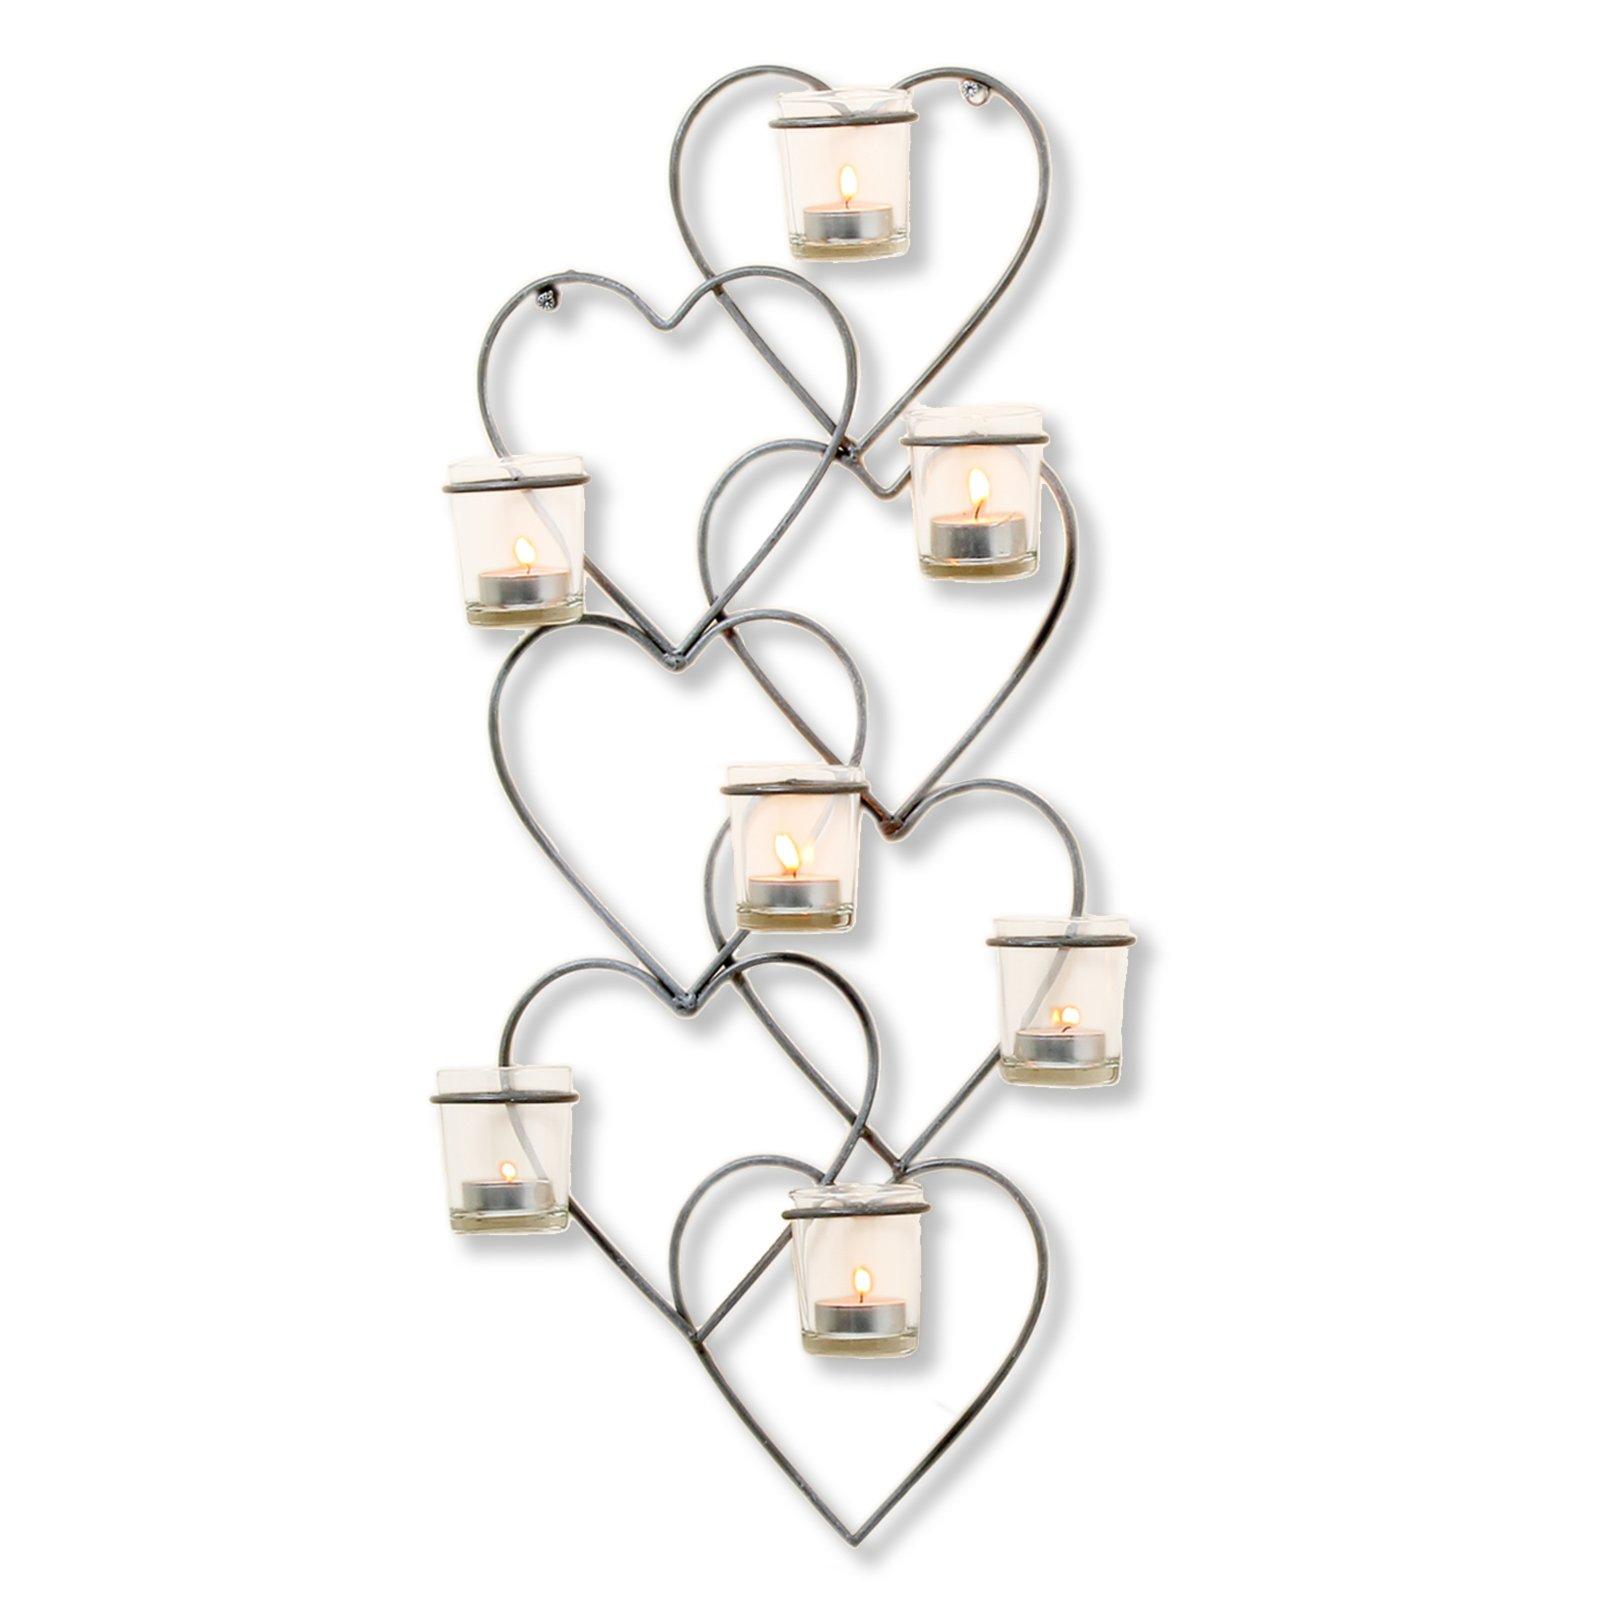 wand teelichthalter anthrazit 7 teelichtgl ser kerzen kerzenhalter deko. Black Bedroom Furniture Sets. Home Design Ideas